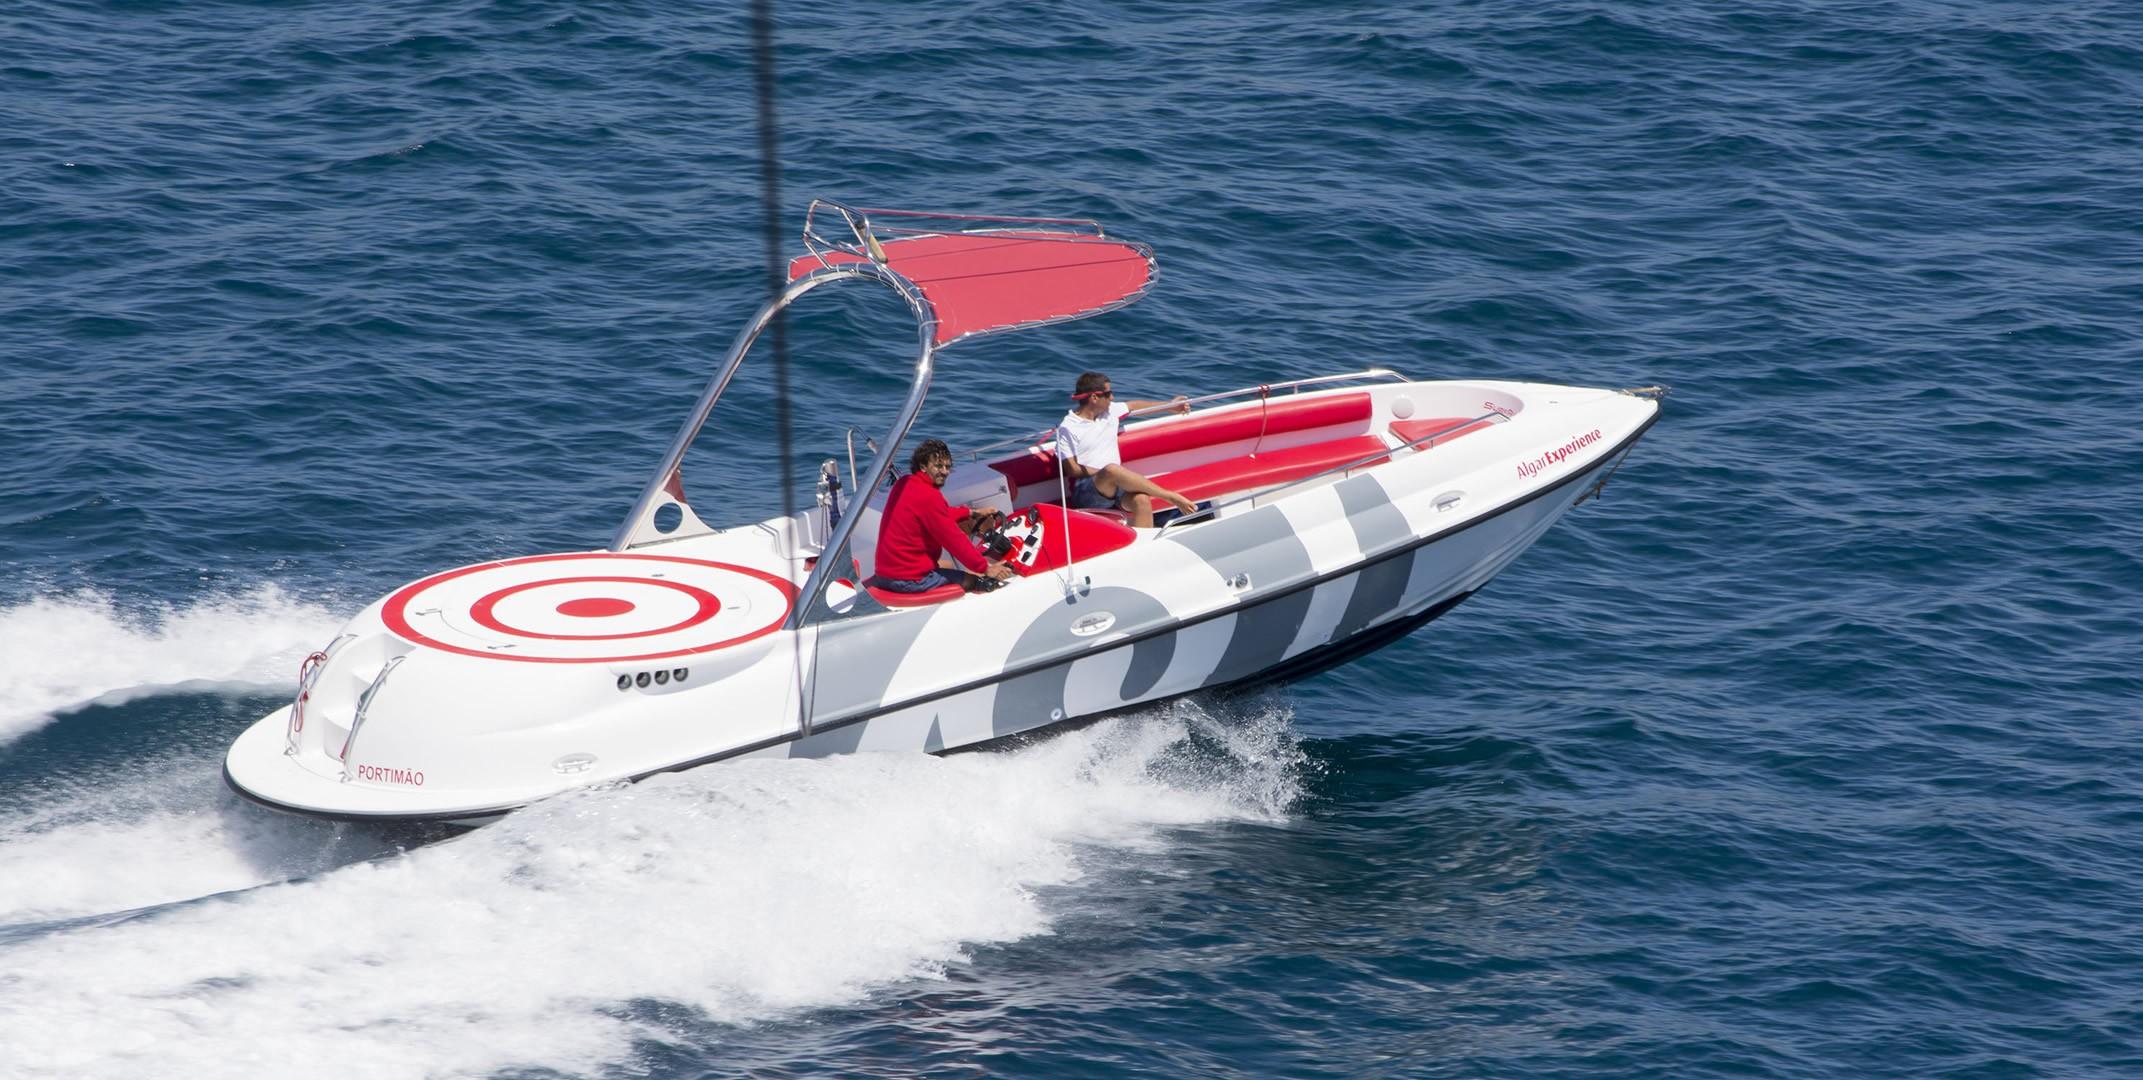 Parasailing-Boote